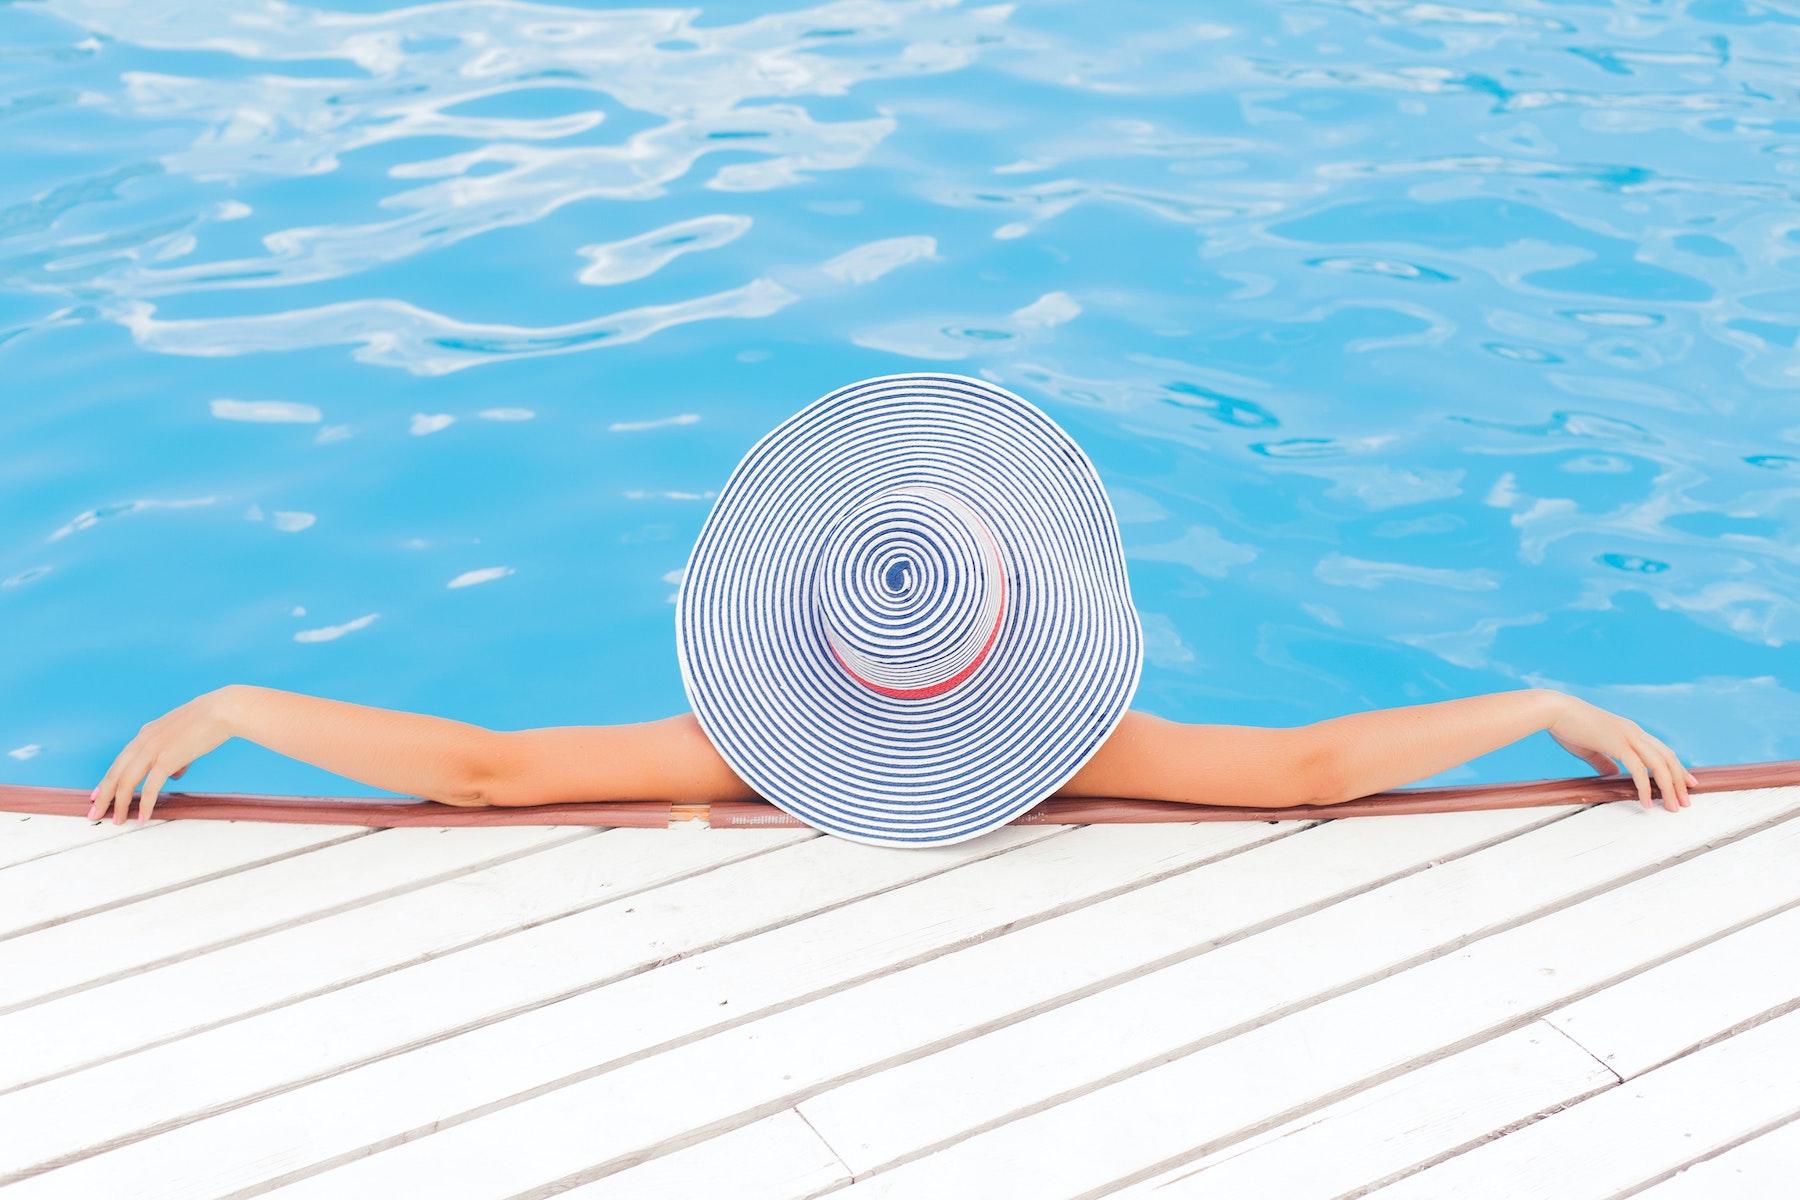 Woman relaxing in pool